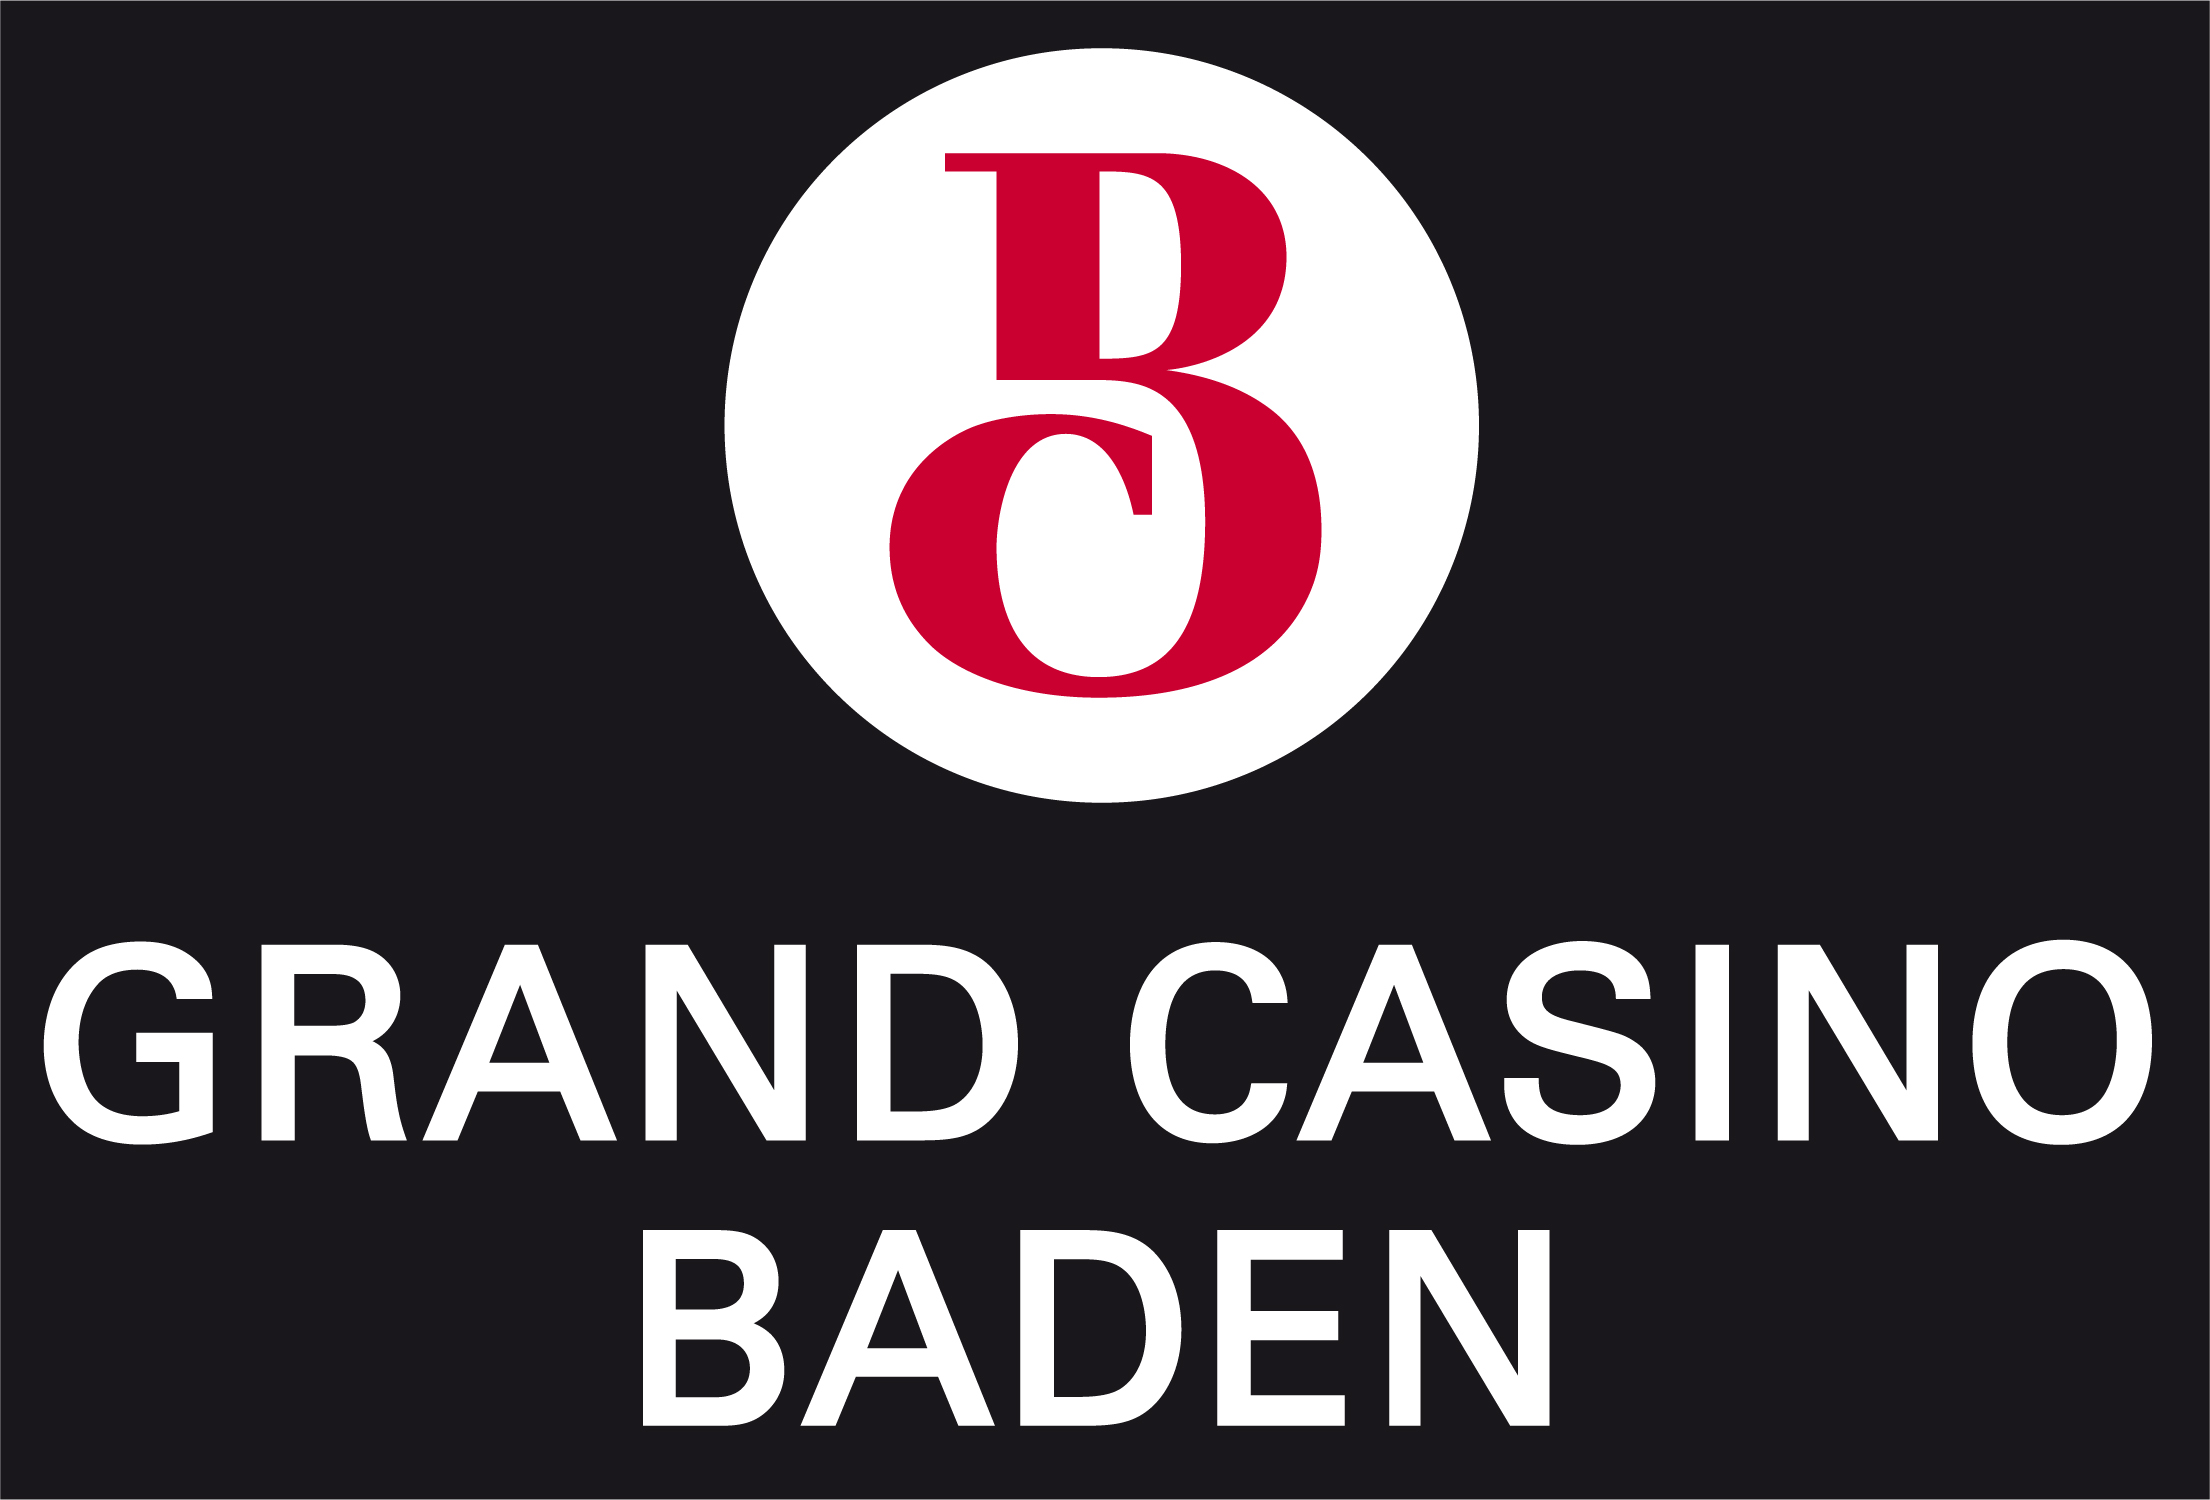 Grand Casino Baden.jpg